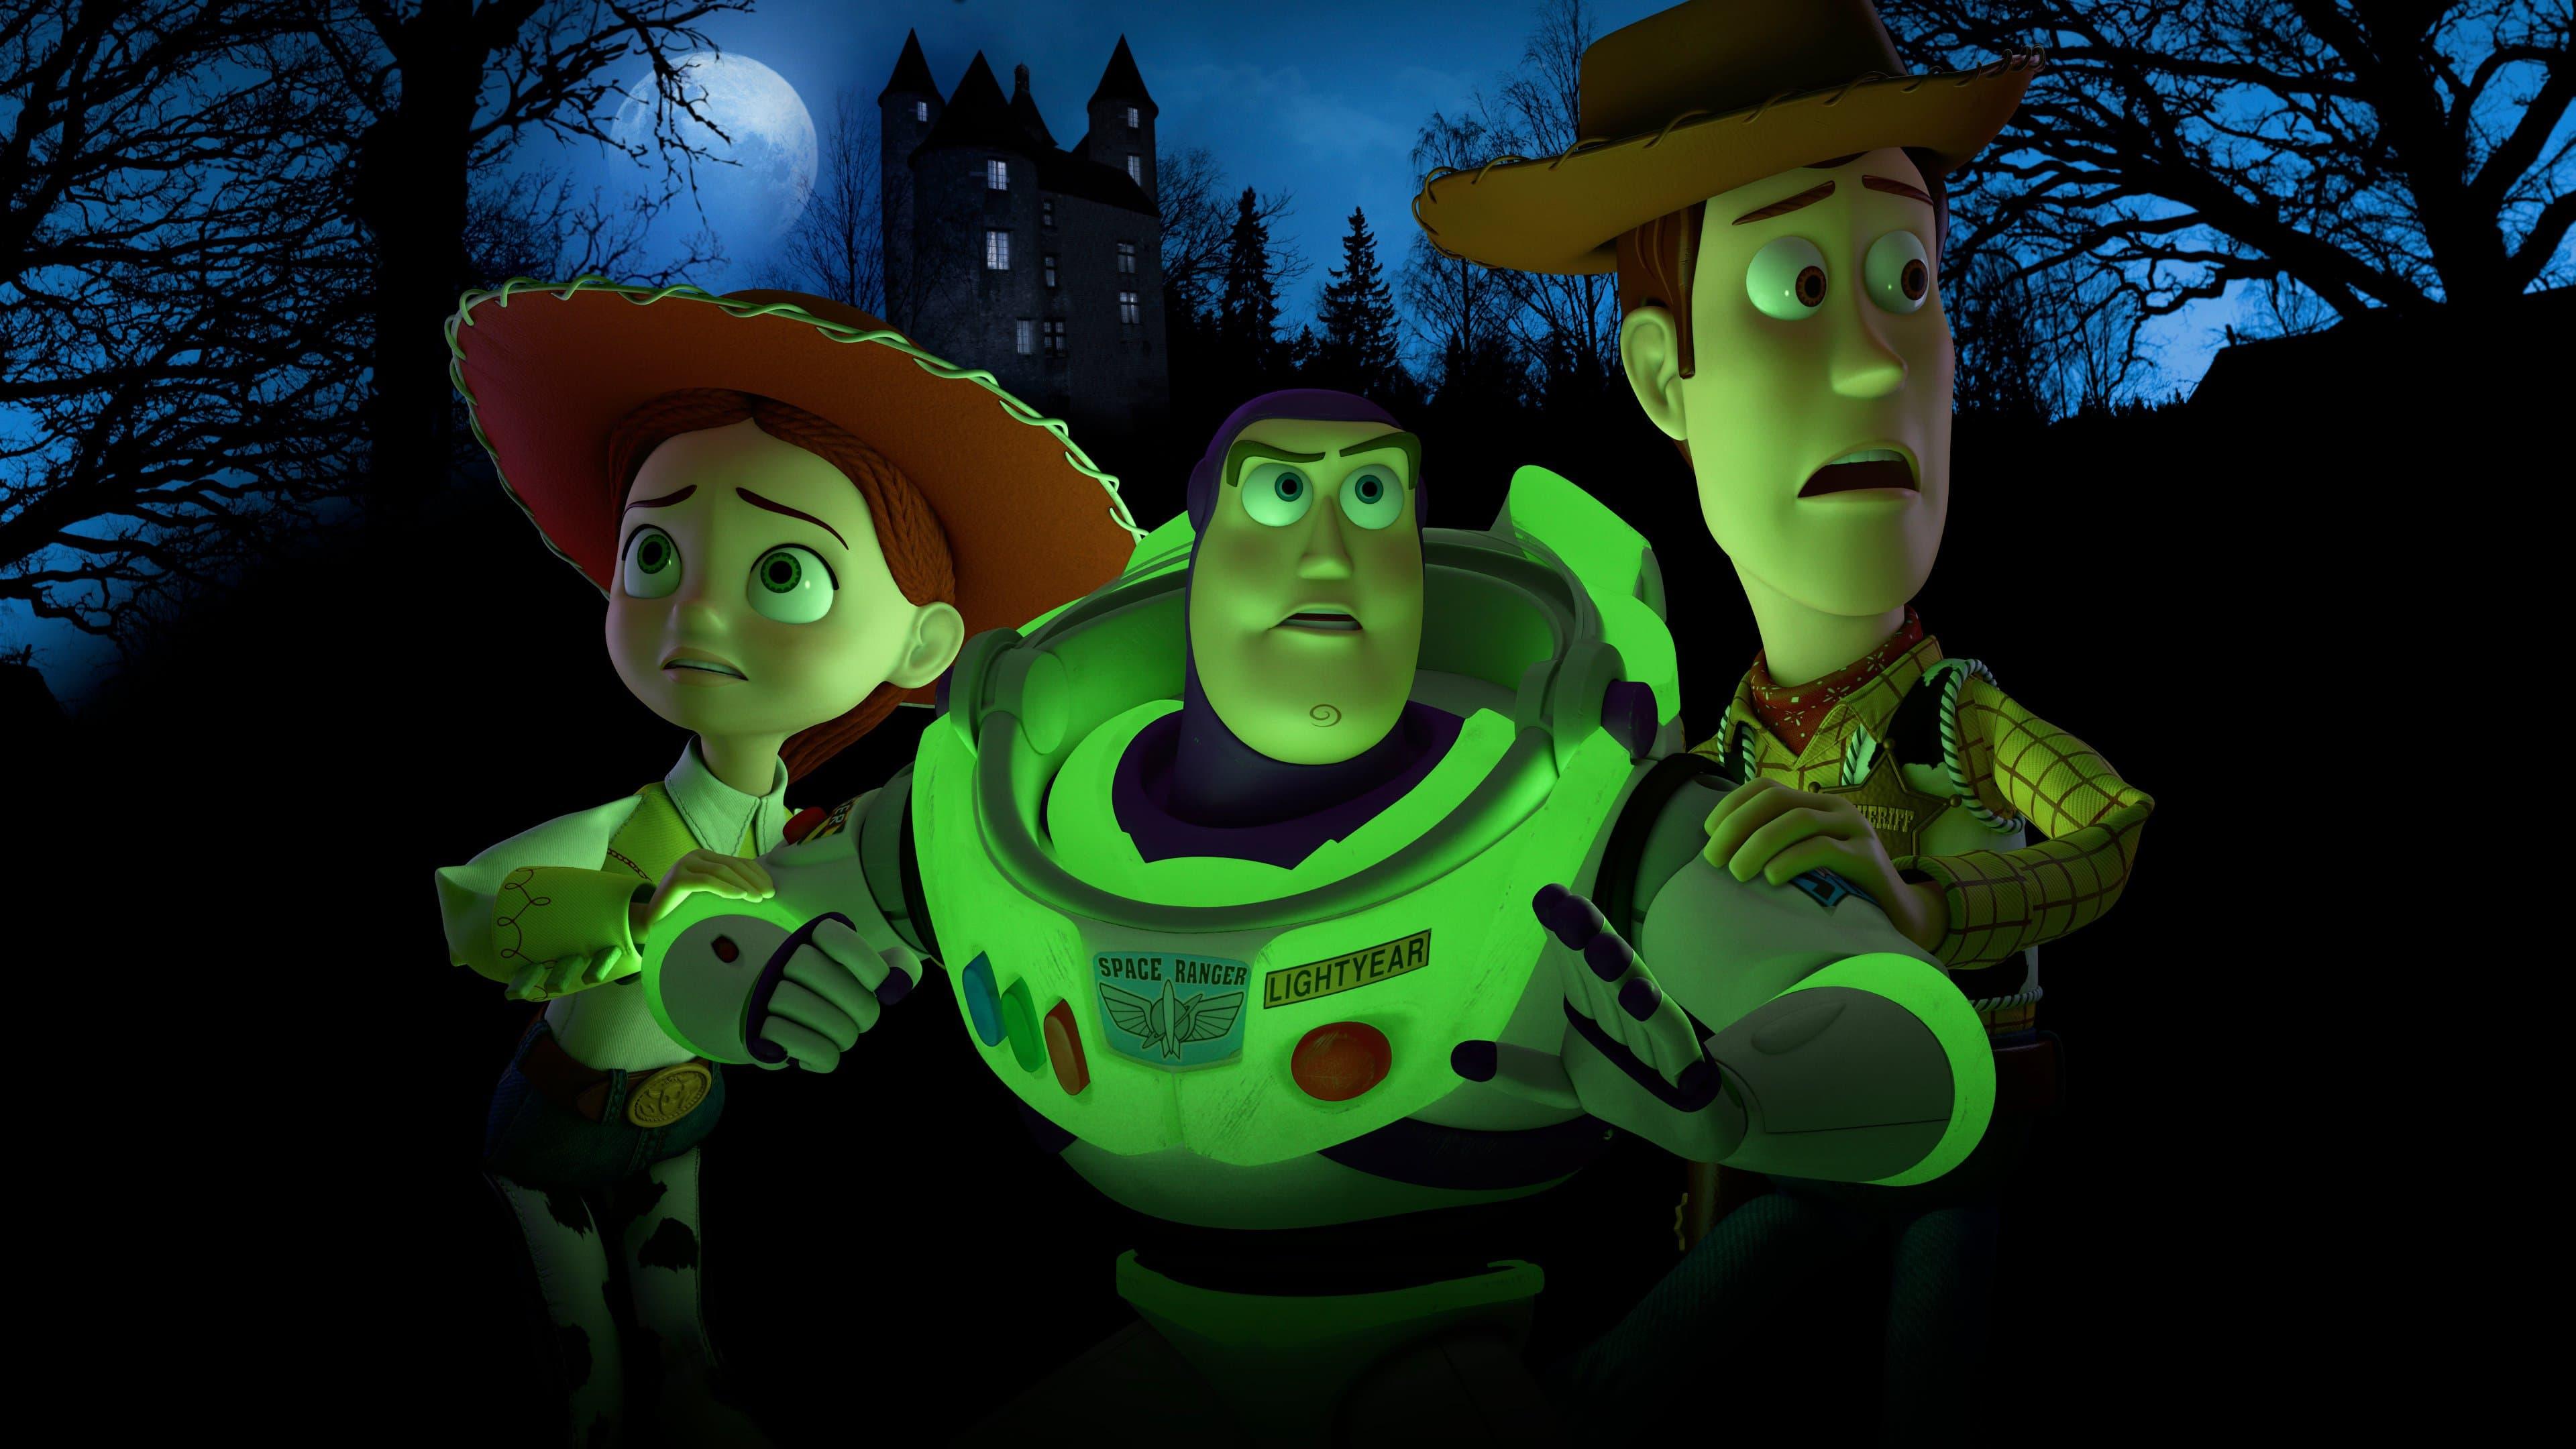 Regarder Toy Story : Angoisse au motel en streaming gratuit